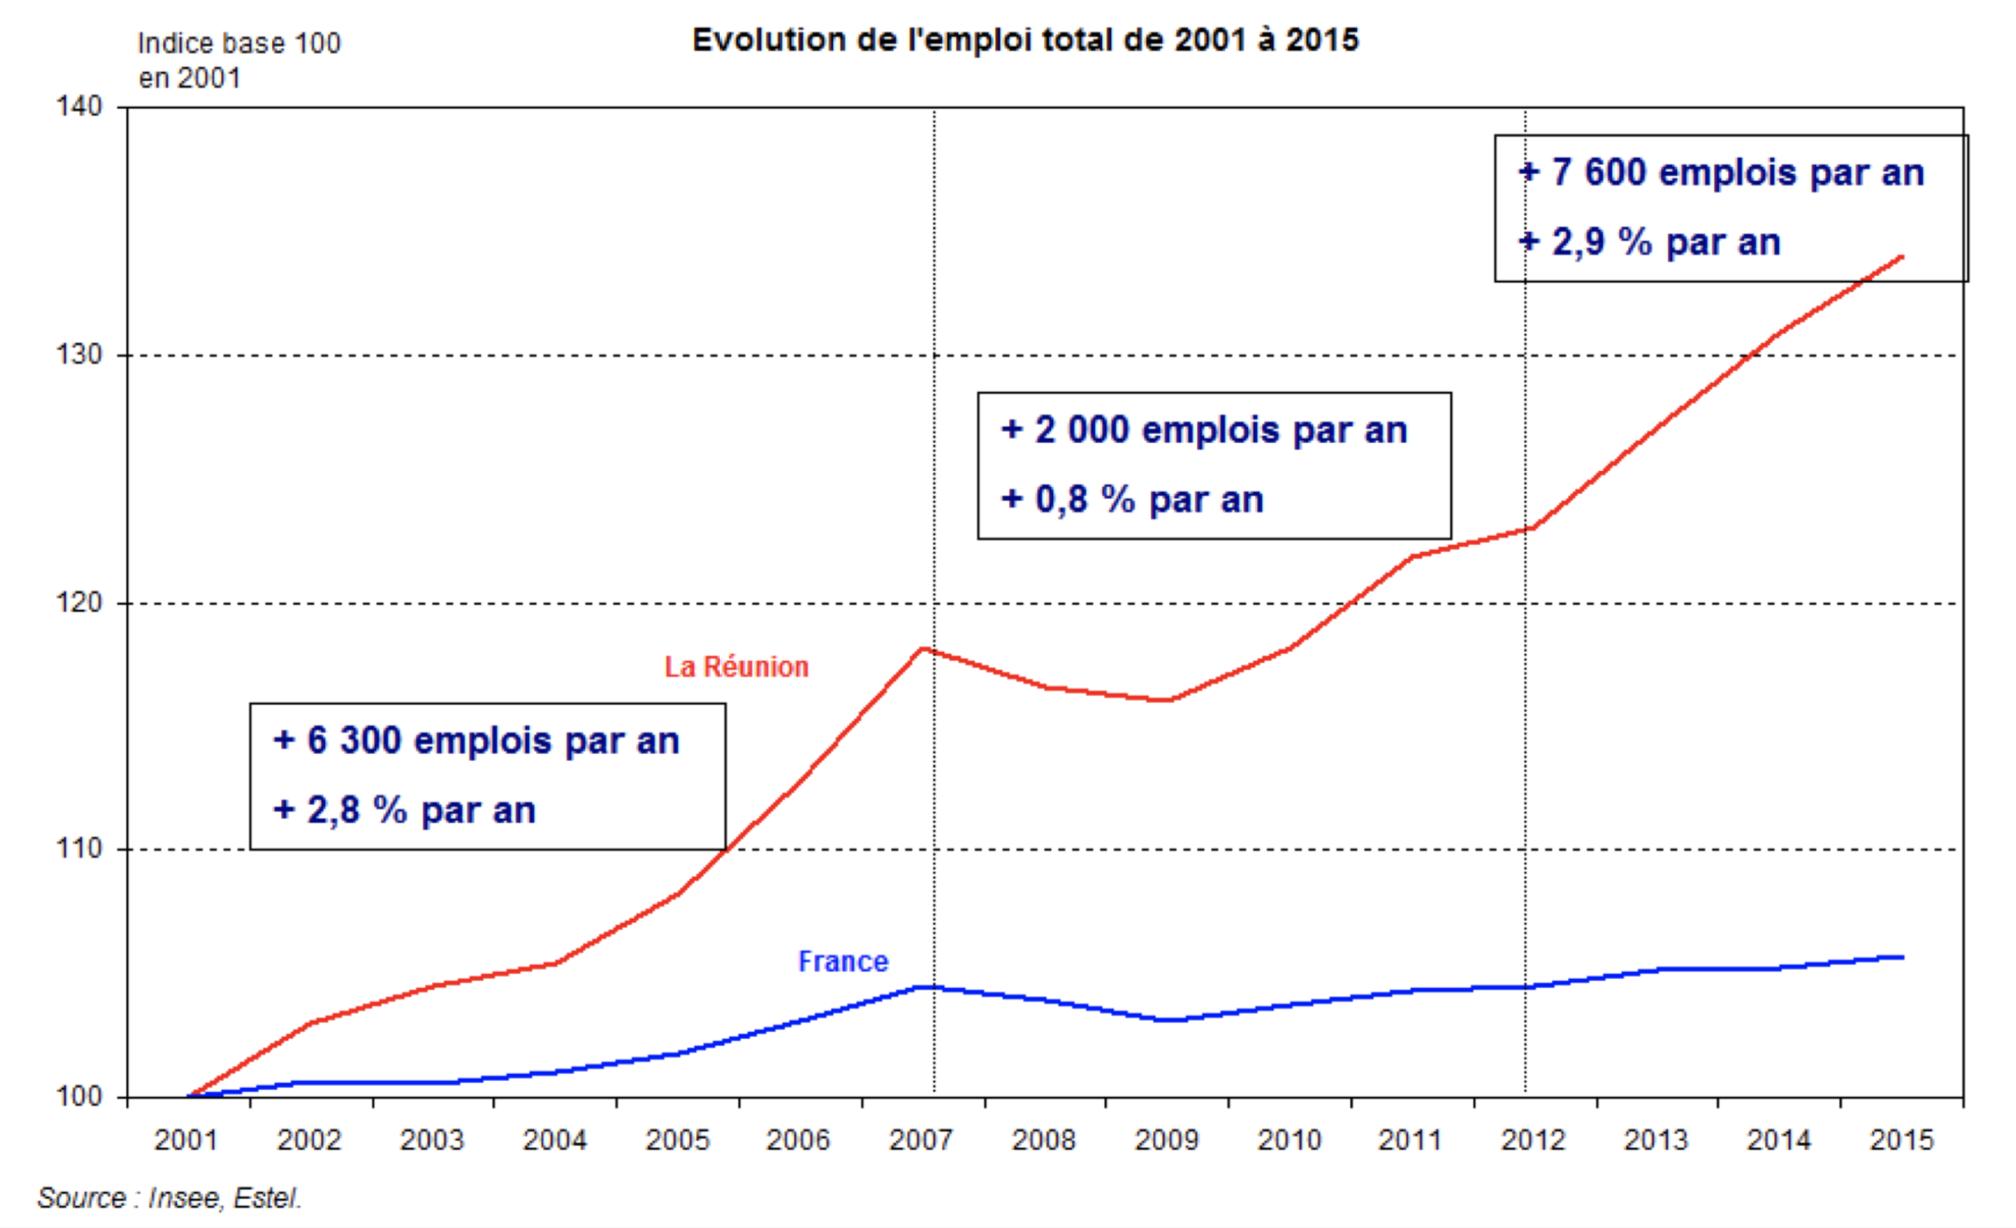 Evolution-emploi-2001-2015-réunion